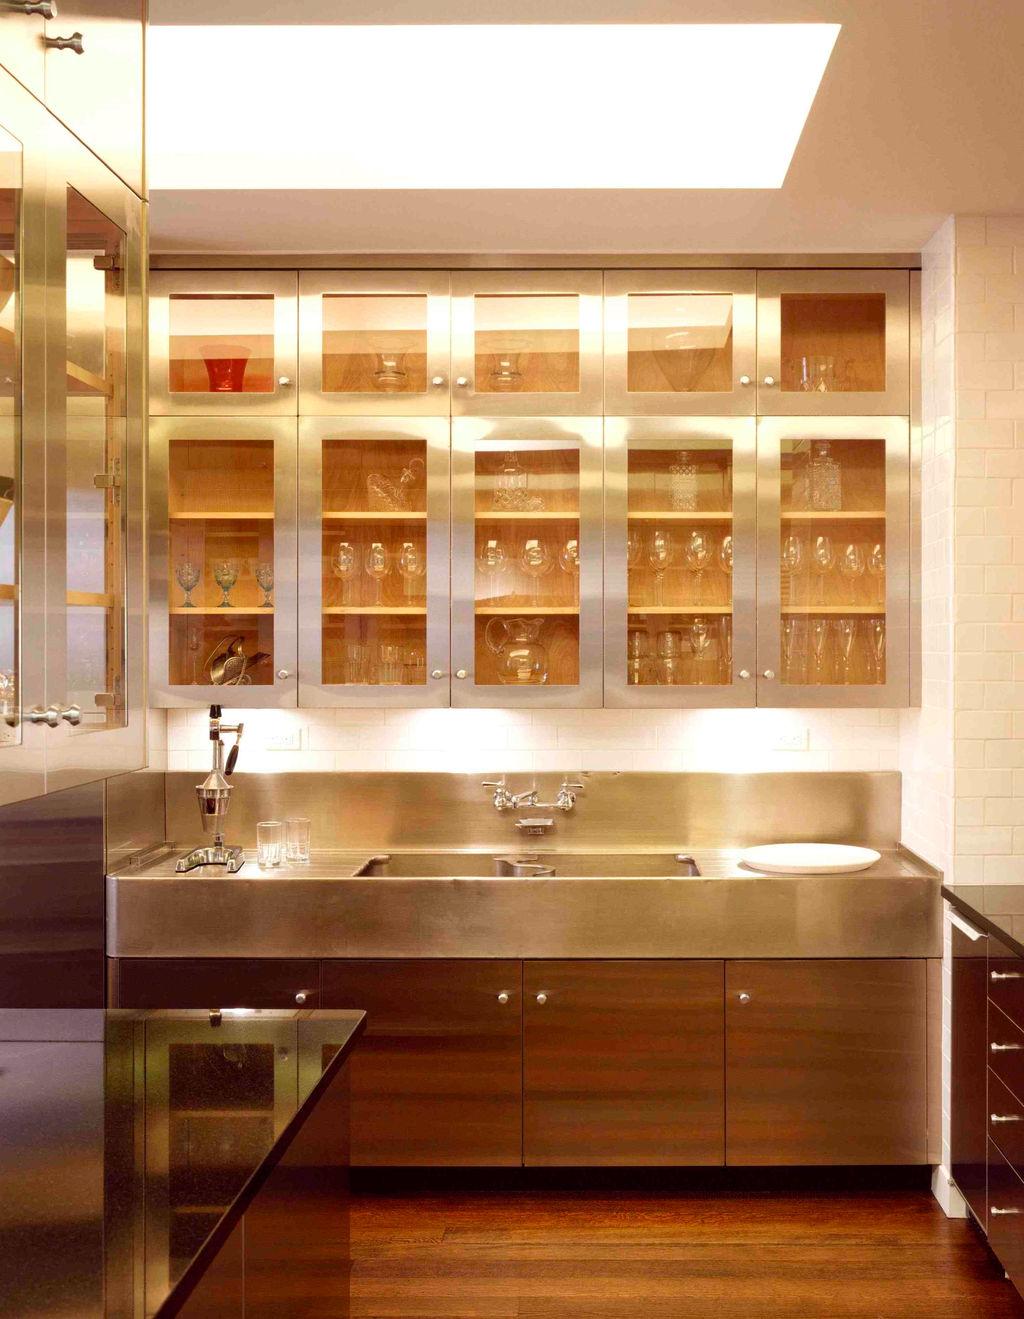 Cabinet Door And White Countertop In Dwyer Kitchen